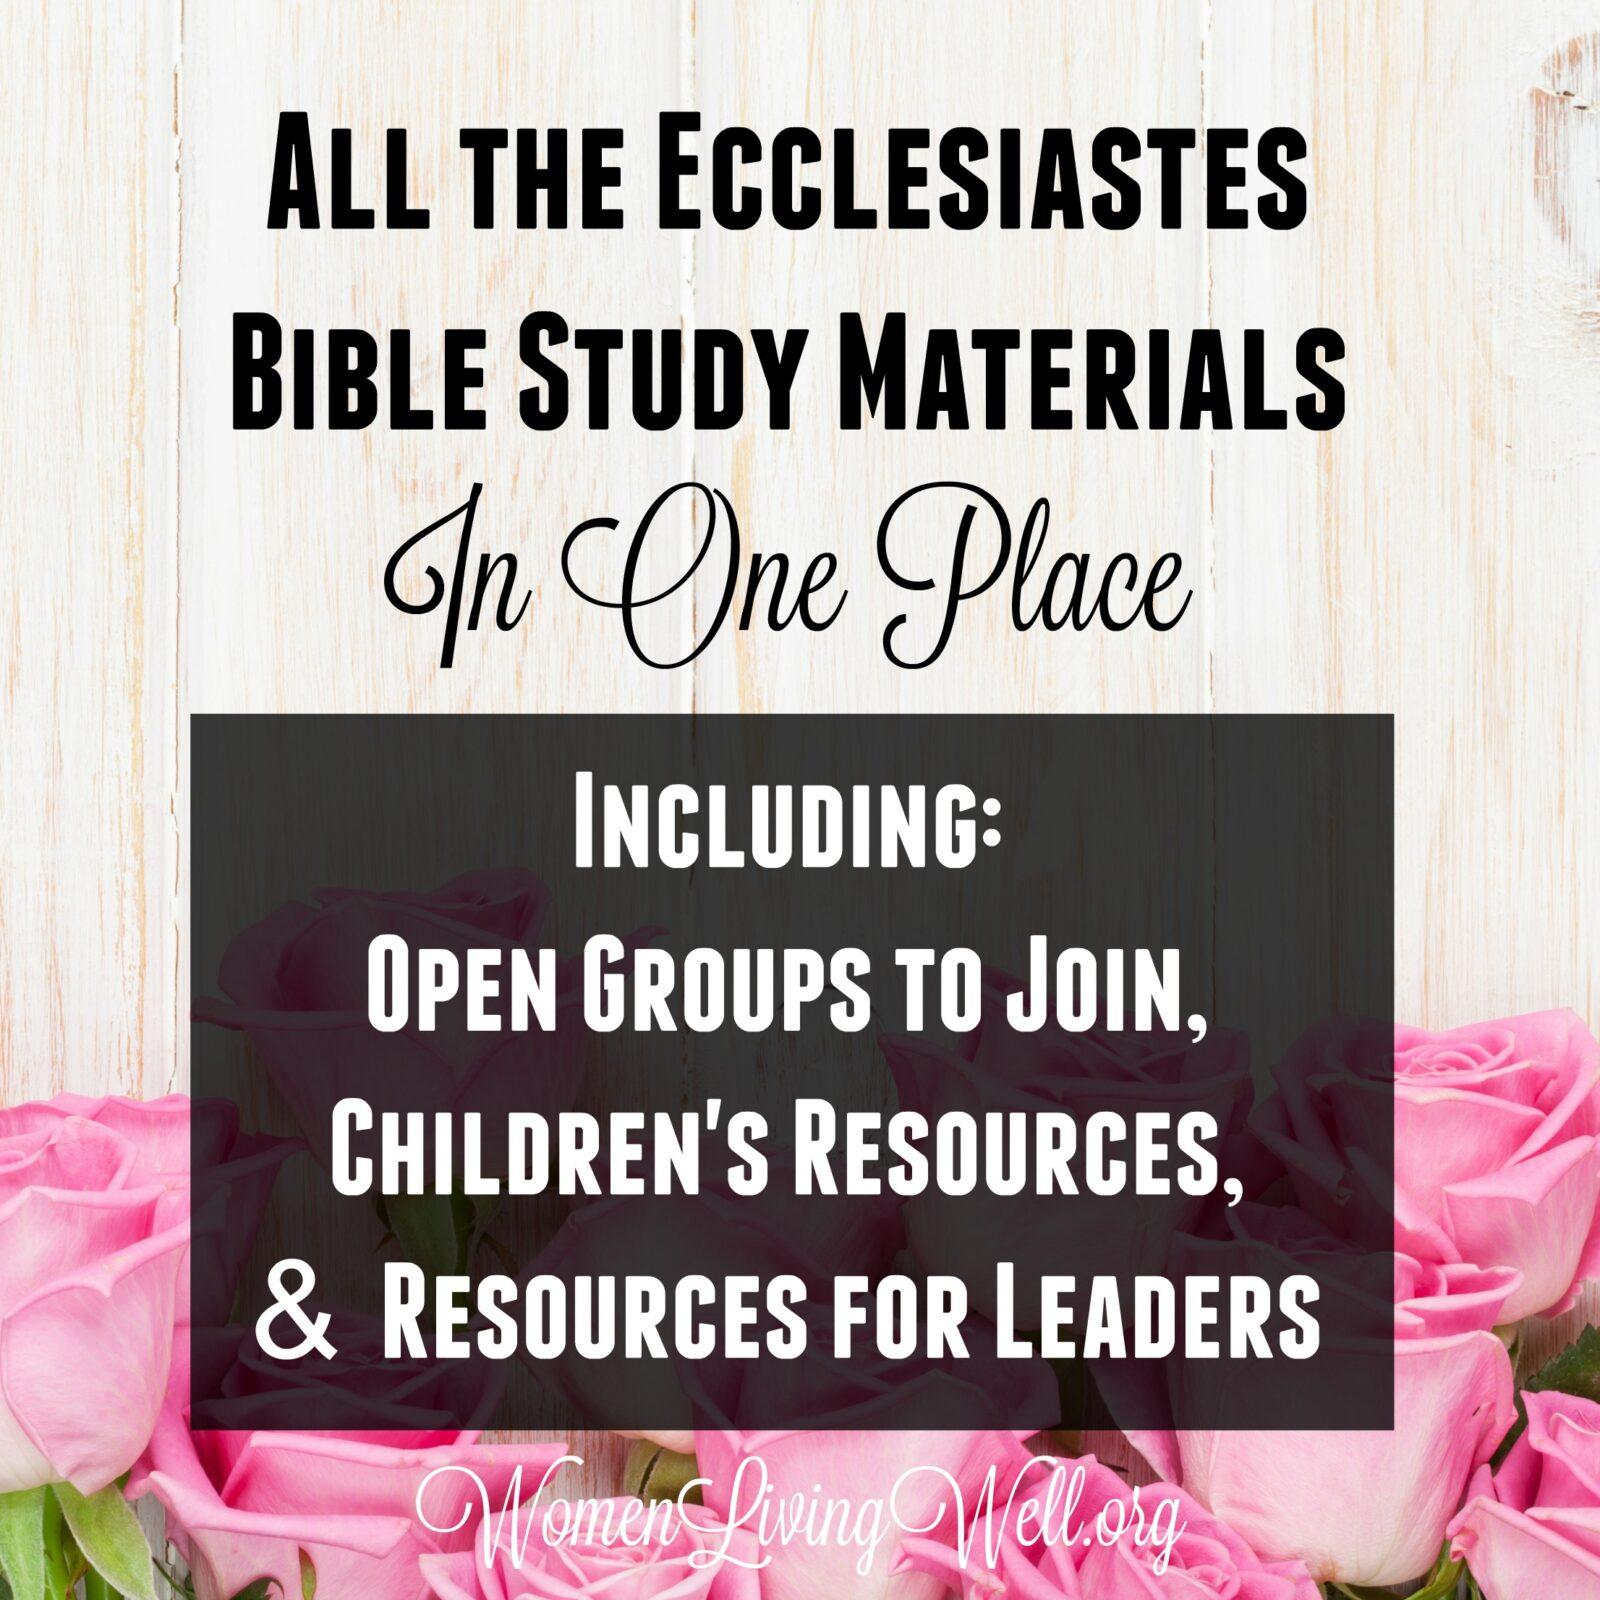 Ecclesiastes Study Guide - ttb.org